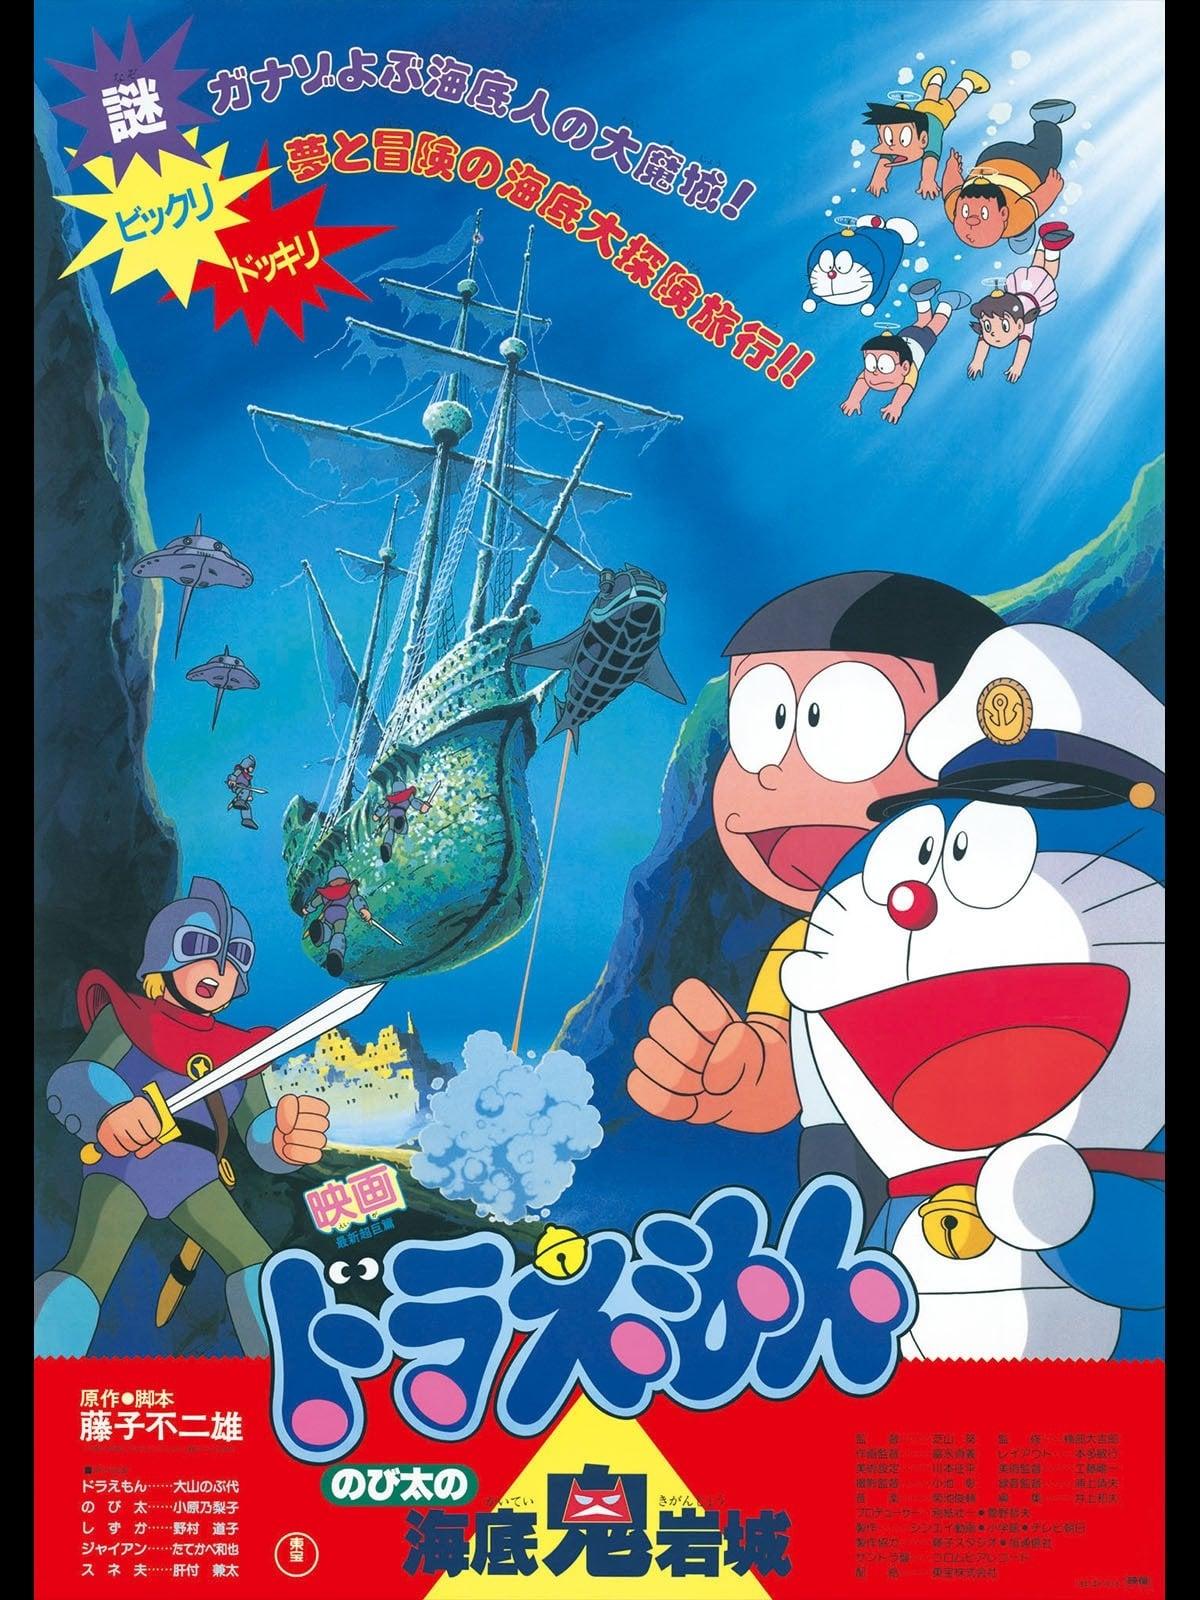 Doraemon: Nobita and the Castle of the Undersea Devil (1983)